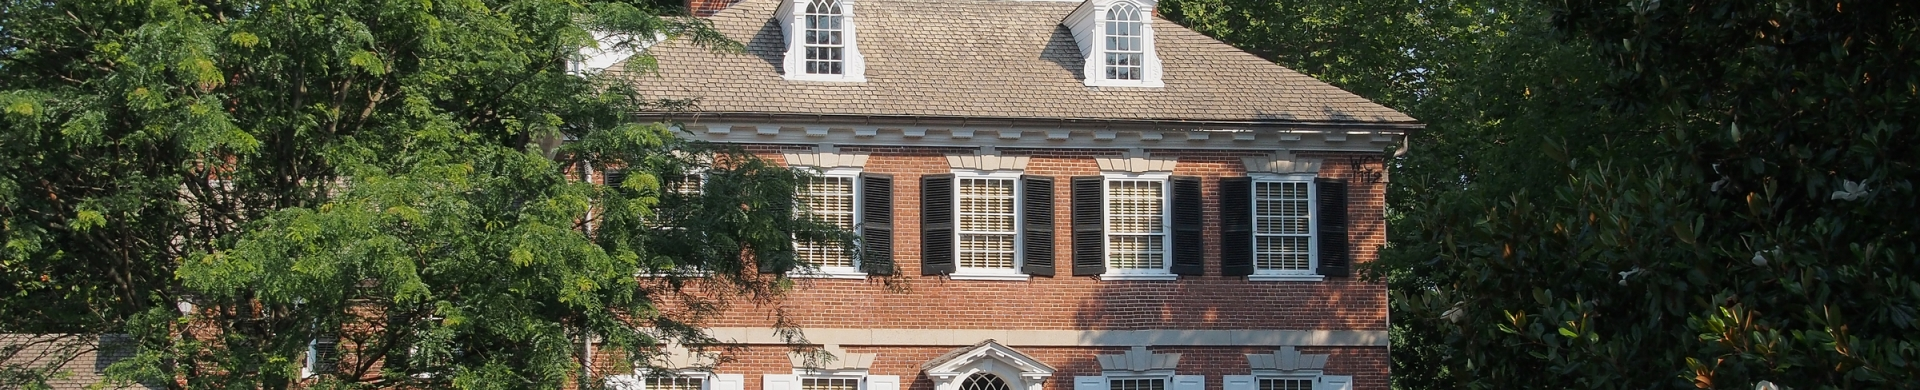 Corbit-Sharp House c. 1774, a National Historic Landmark